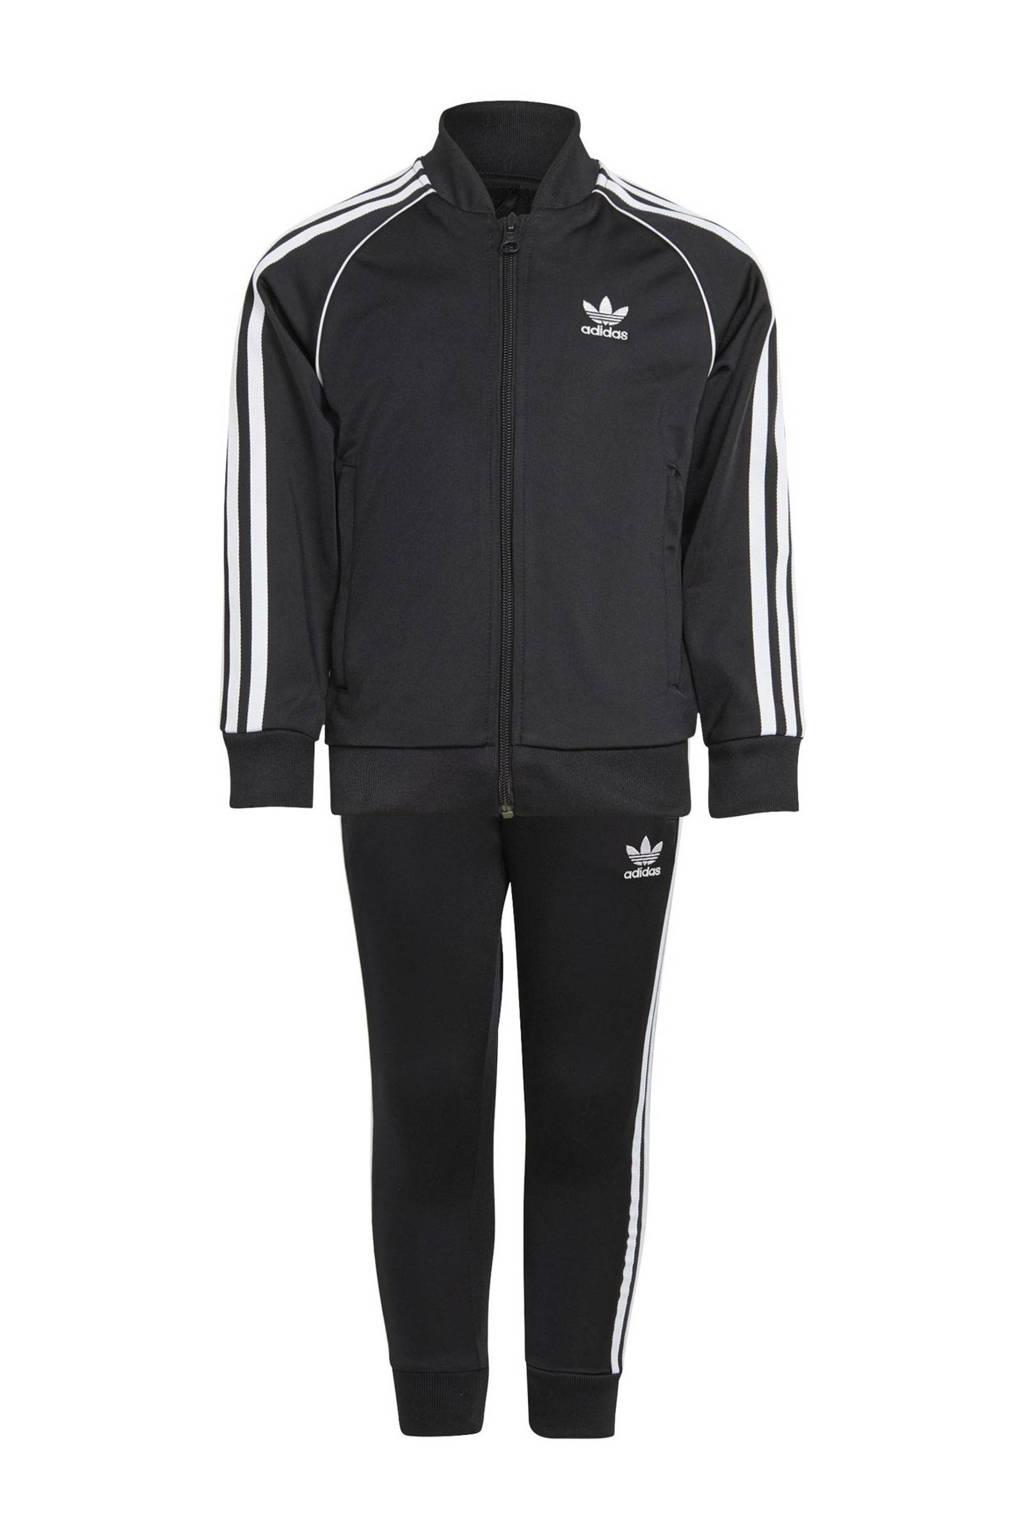 adidas Originals   Super Star Adicolor trainingspak zwart/wit, Zwart/wit